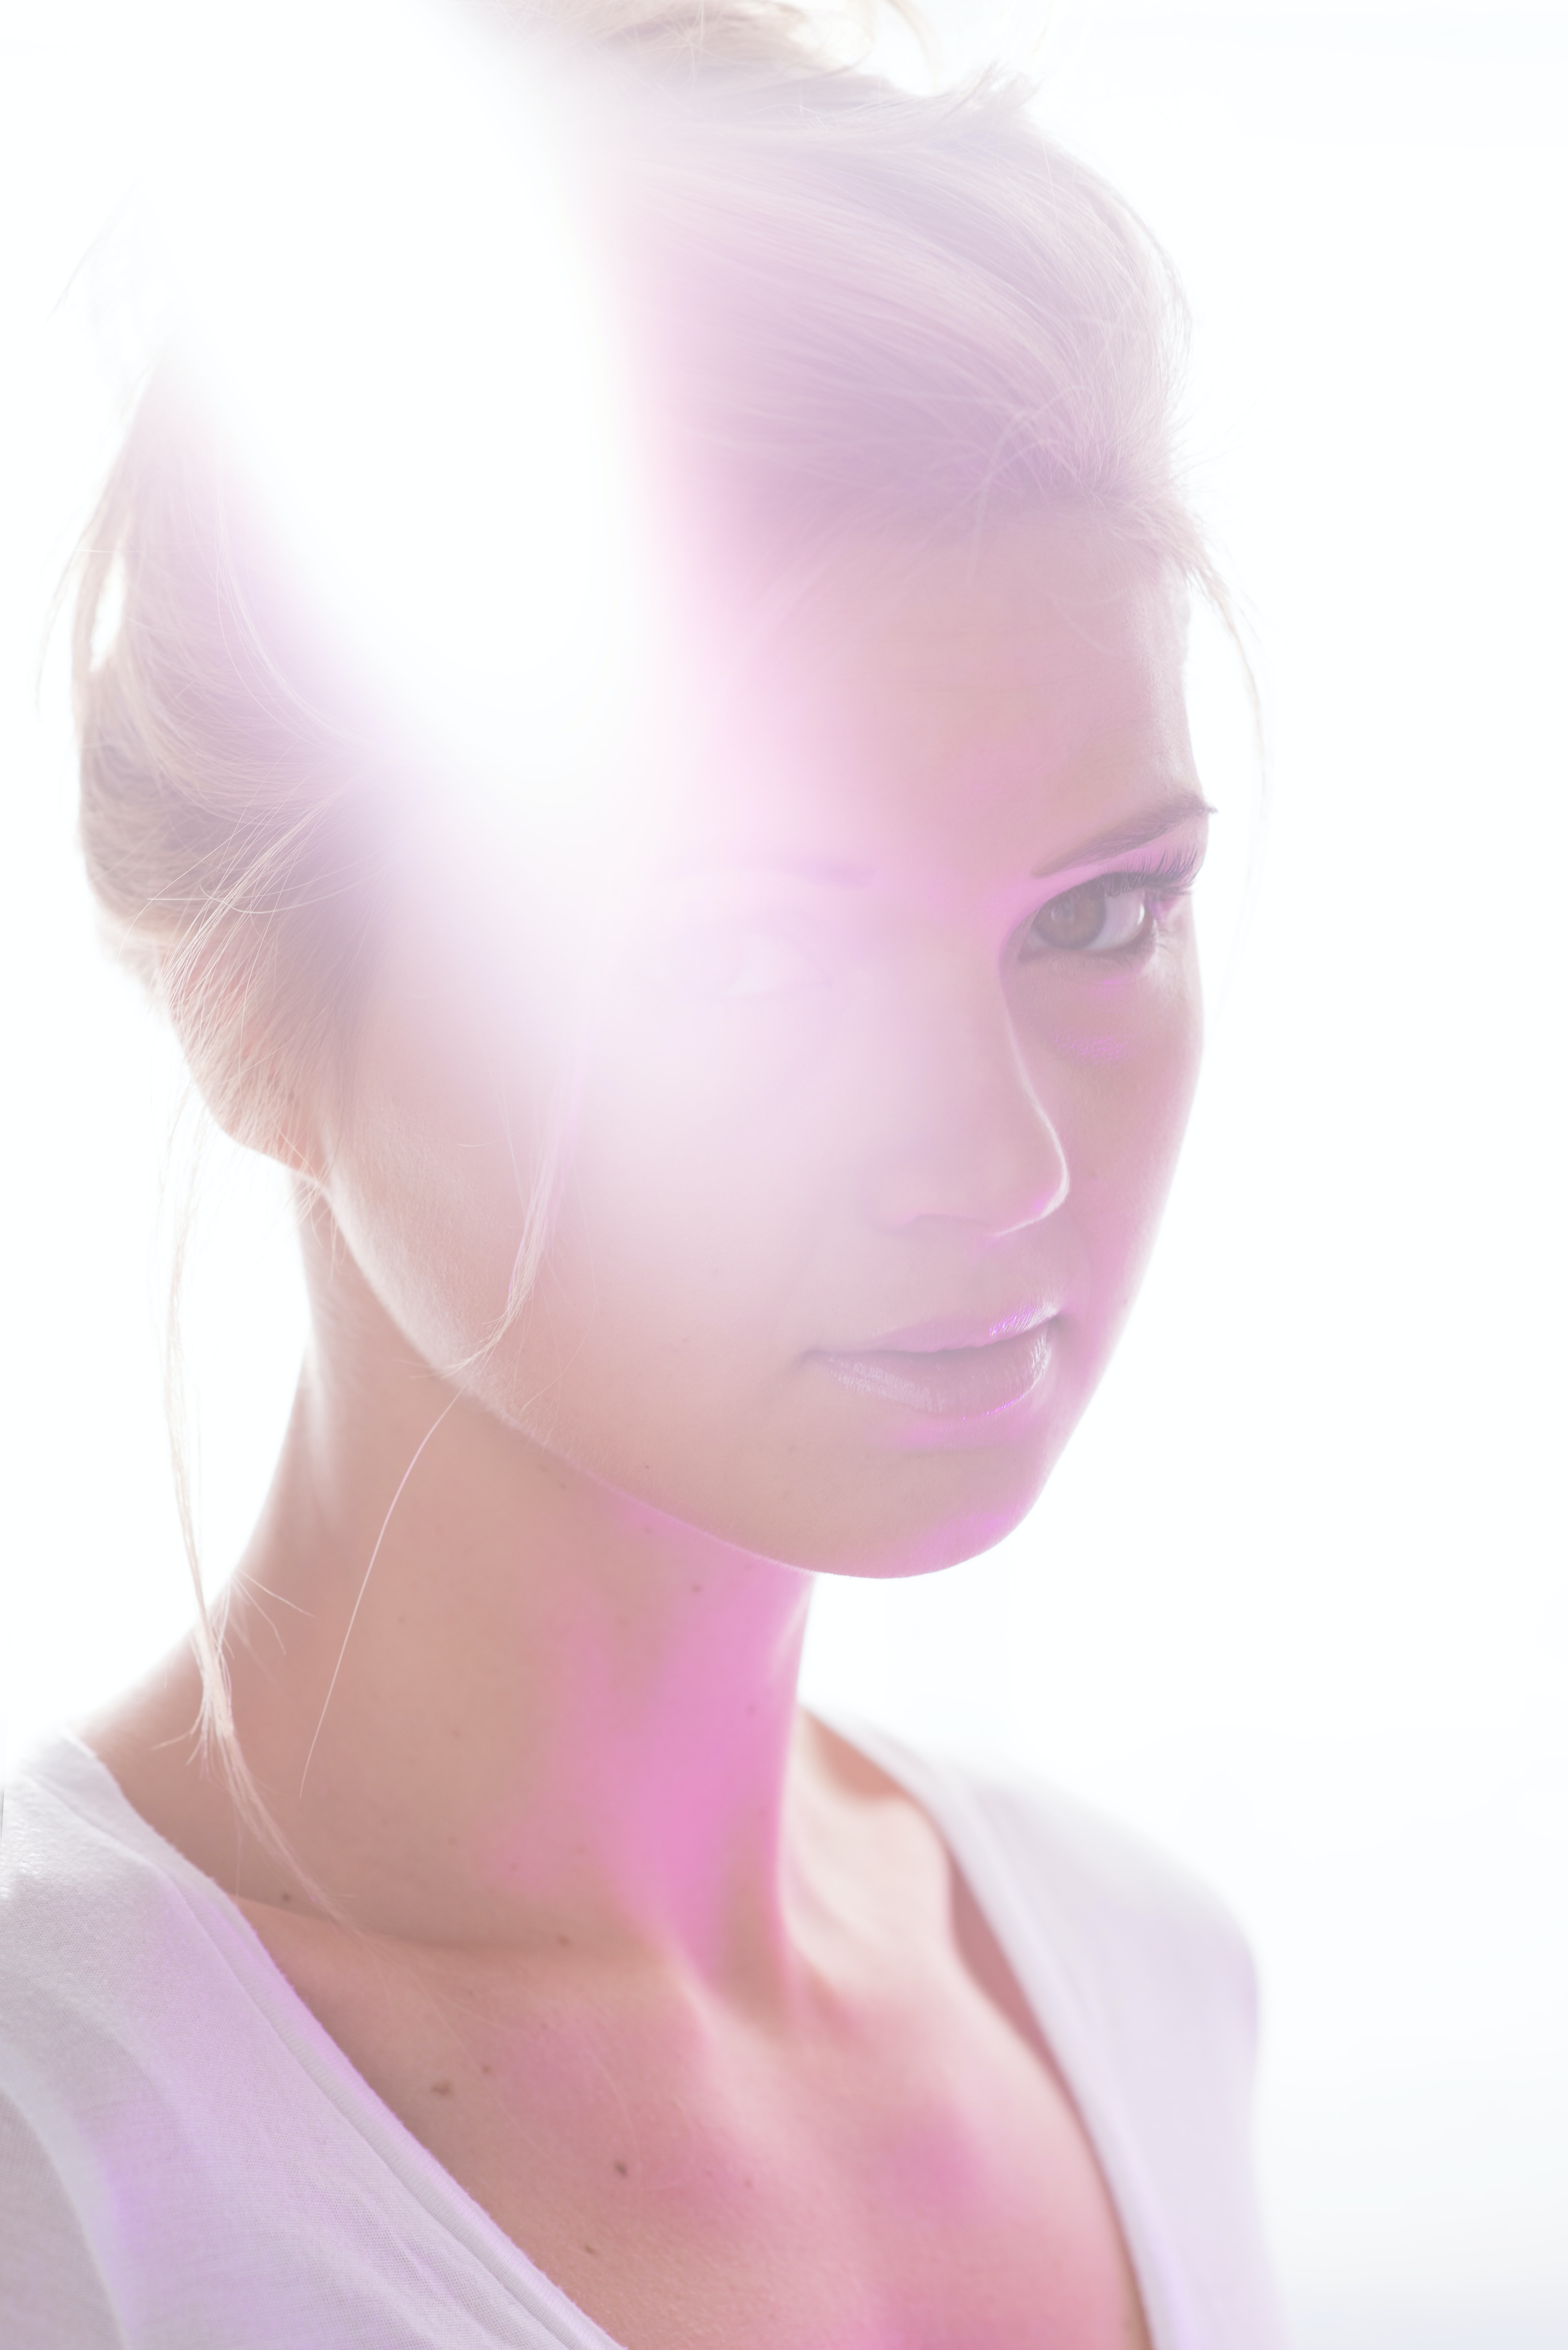 woman wearing white scoop-neck shirt